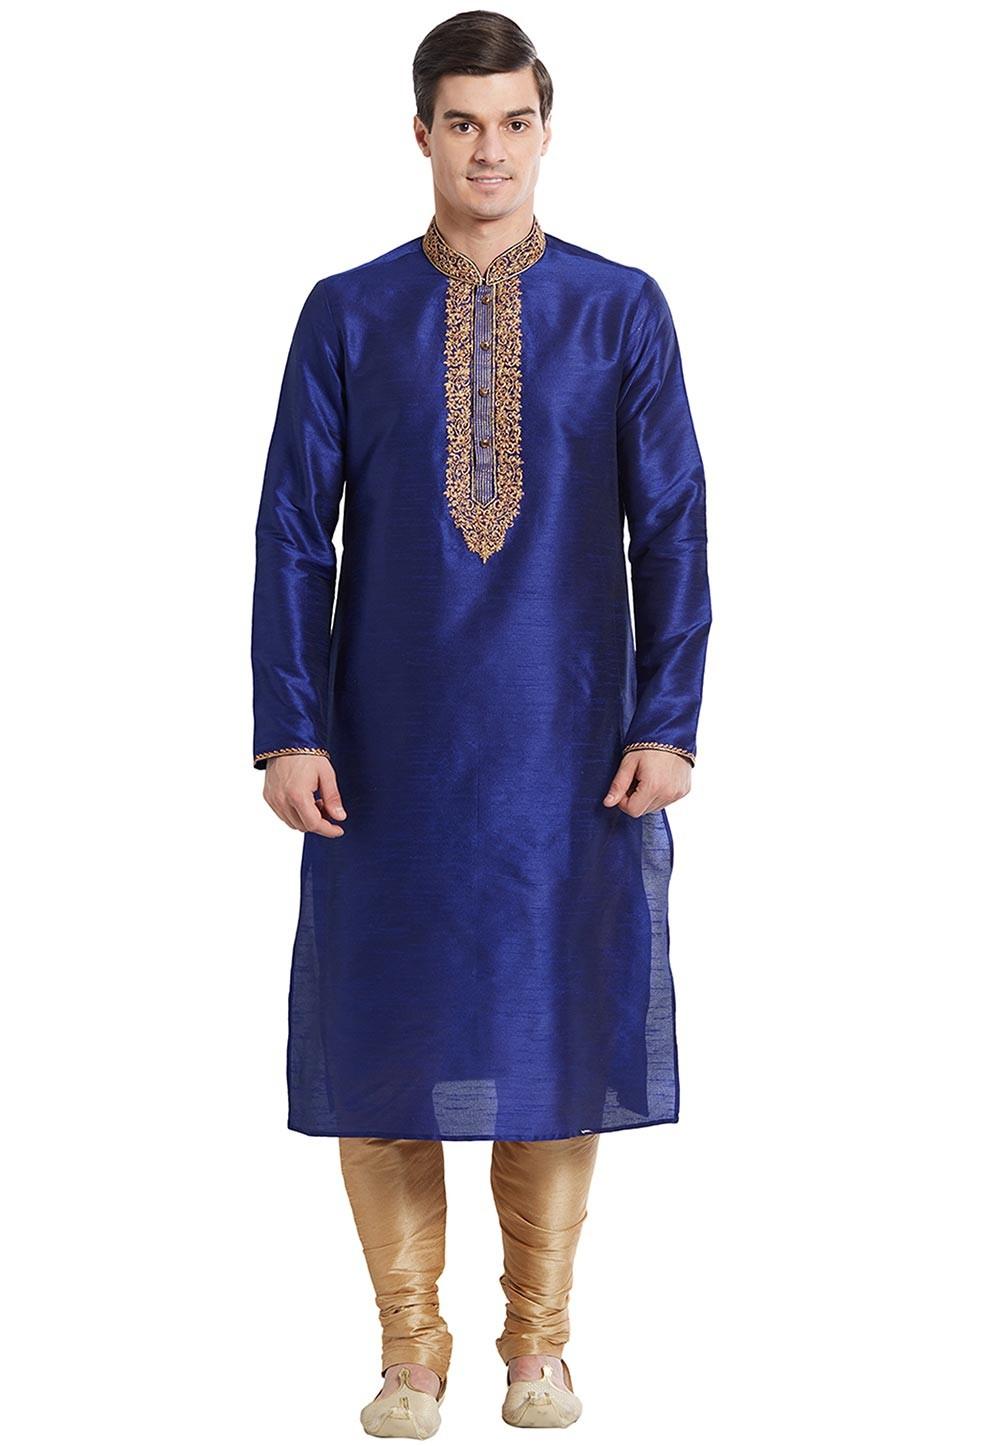 Blue Color Silk Designer Kurta Pajama With Embroidery Work